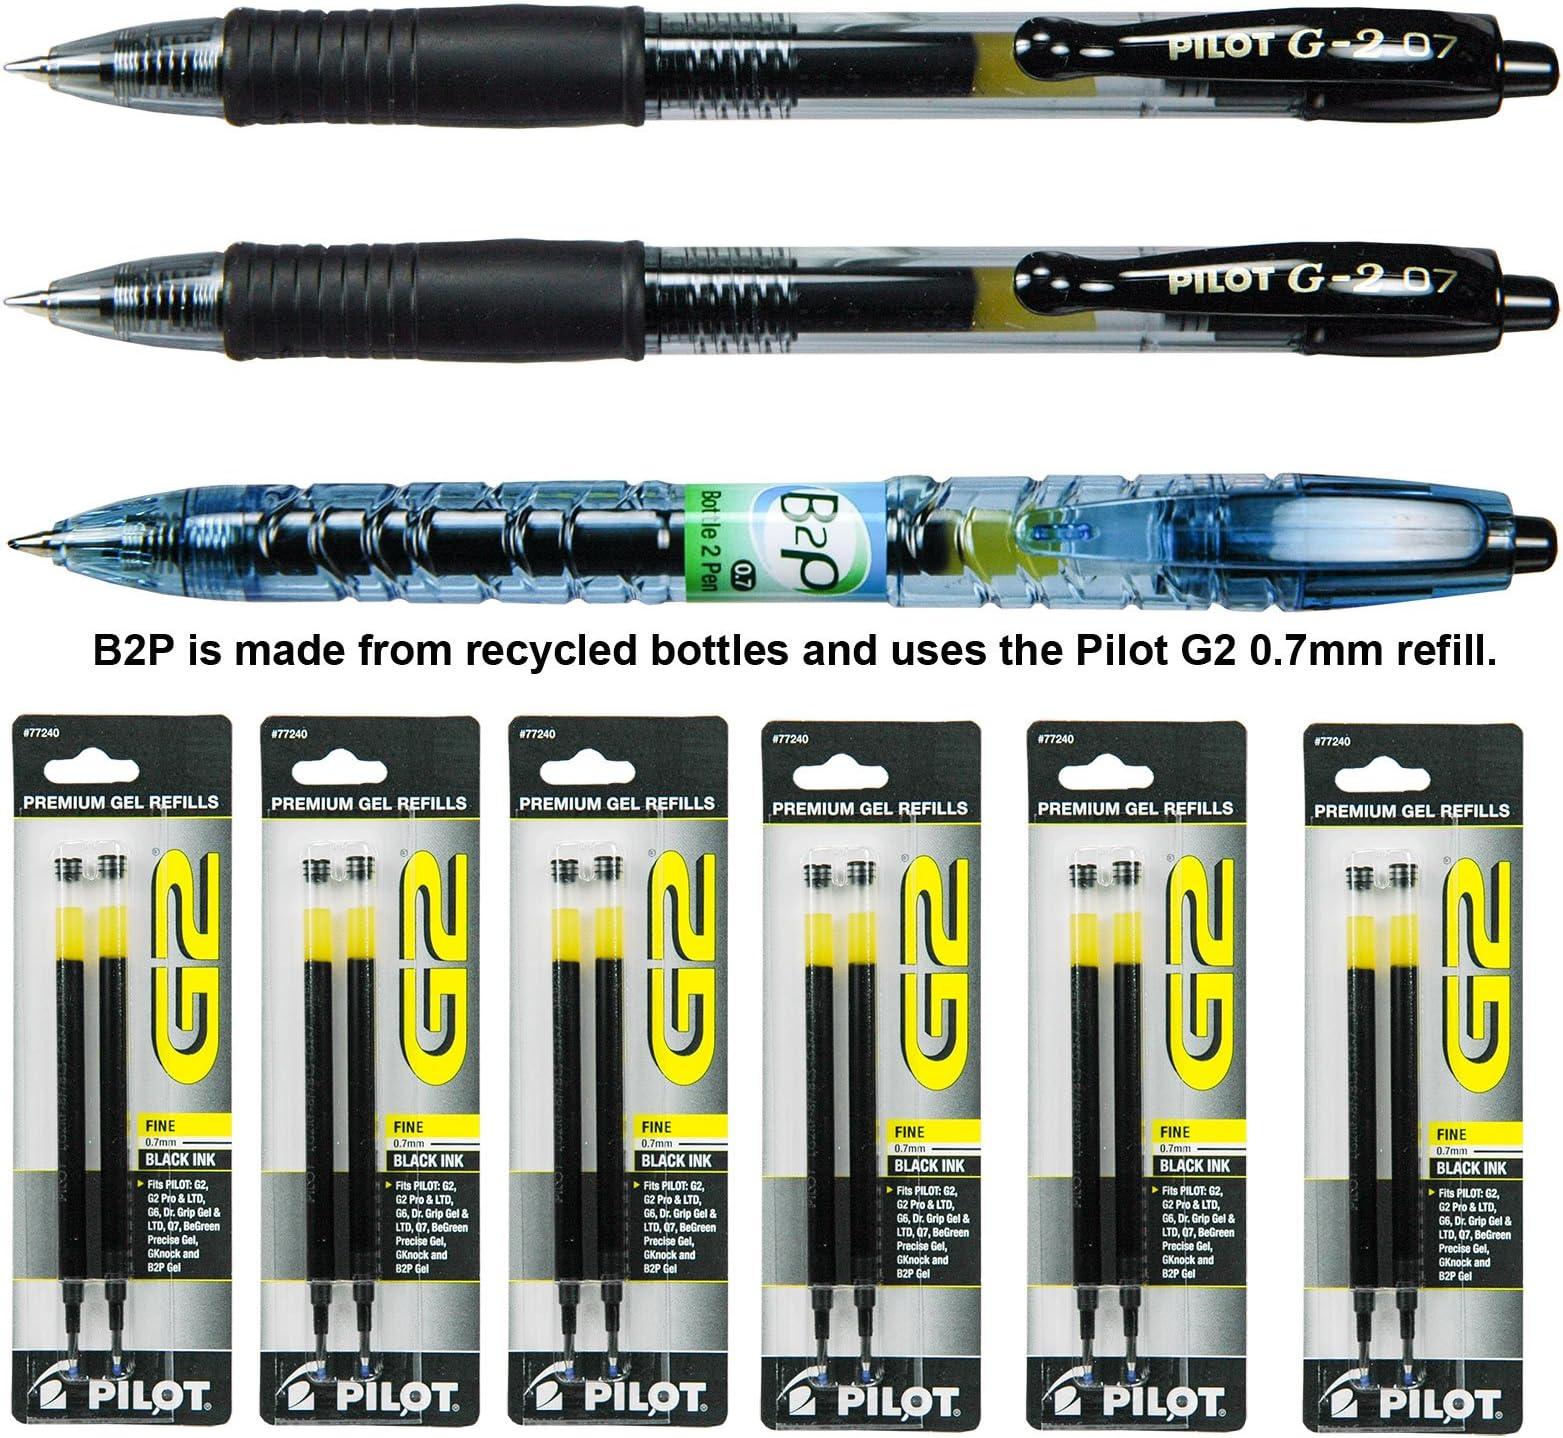 3 x Pilot G-2 07 Gel Ink Rollerball Pens Blue Ink Victoria Edition Barrel